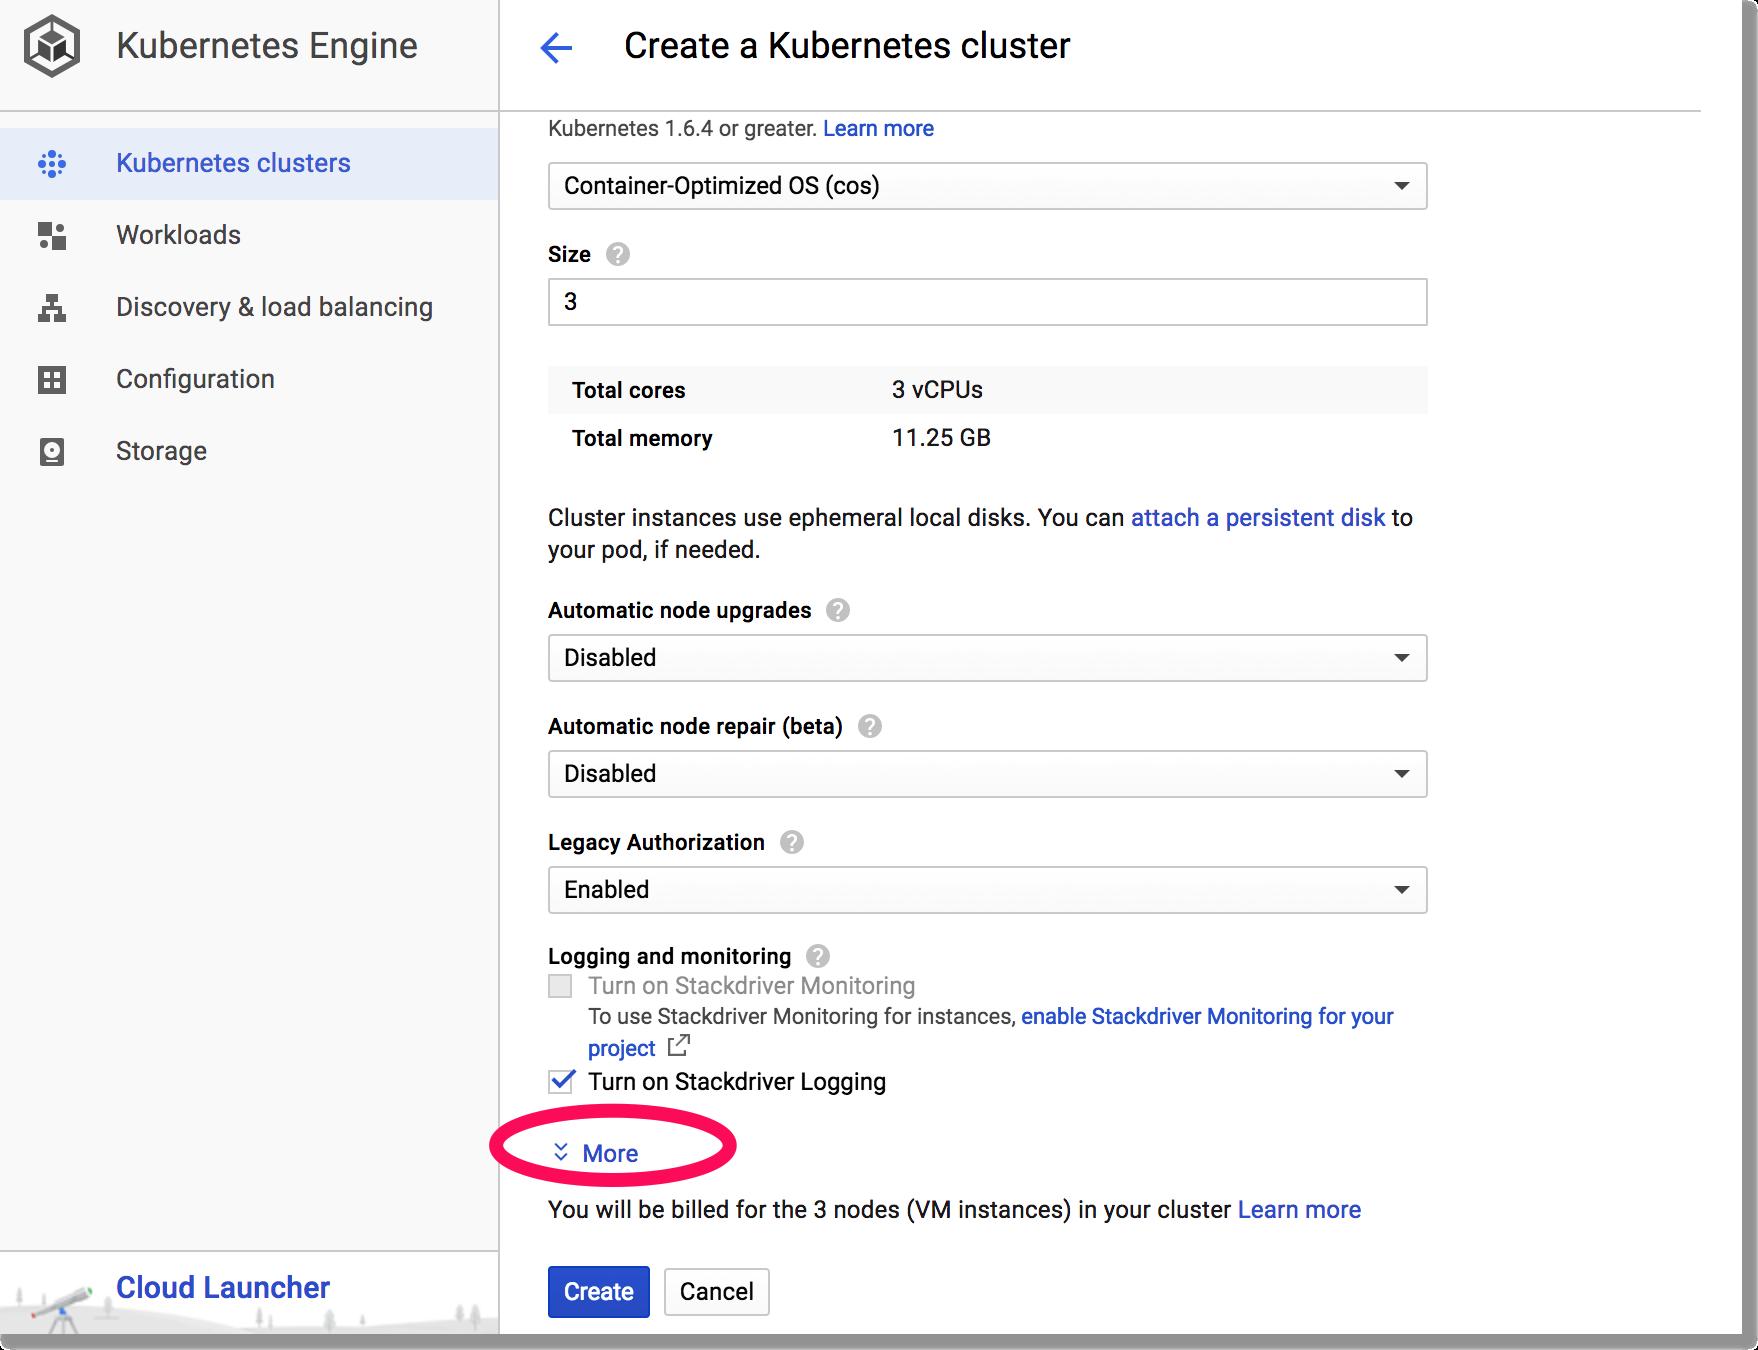 kubernetes-bigquery-python/README md at master · GoogleCloudPlatform